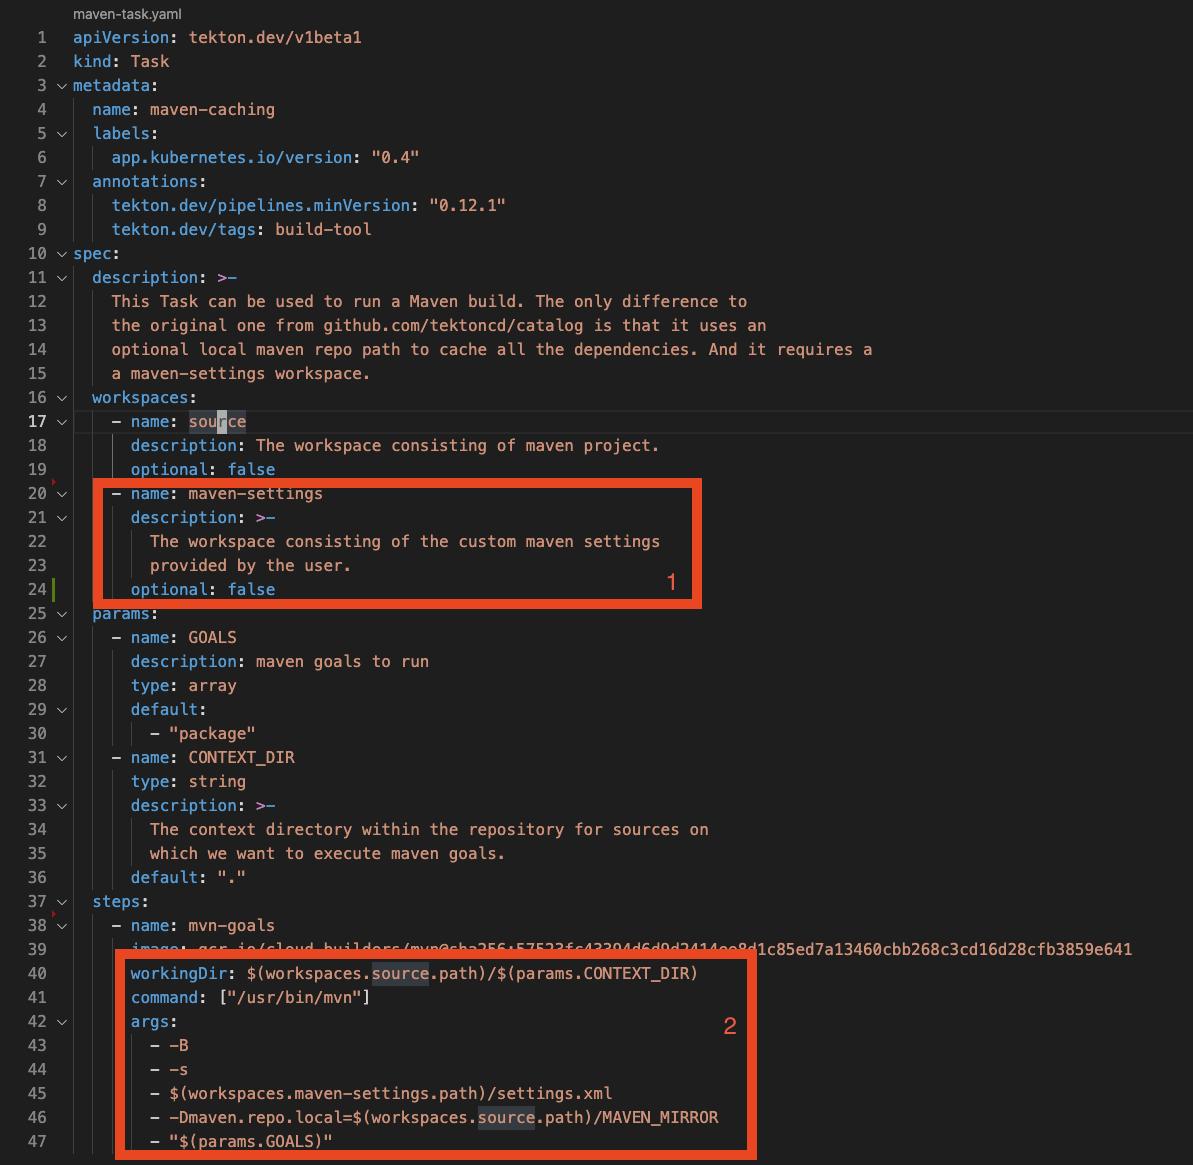 Image 9: Simplified Maven Task